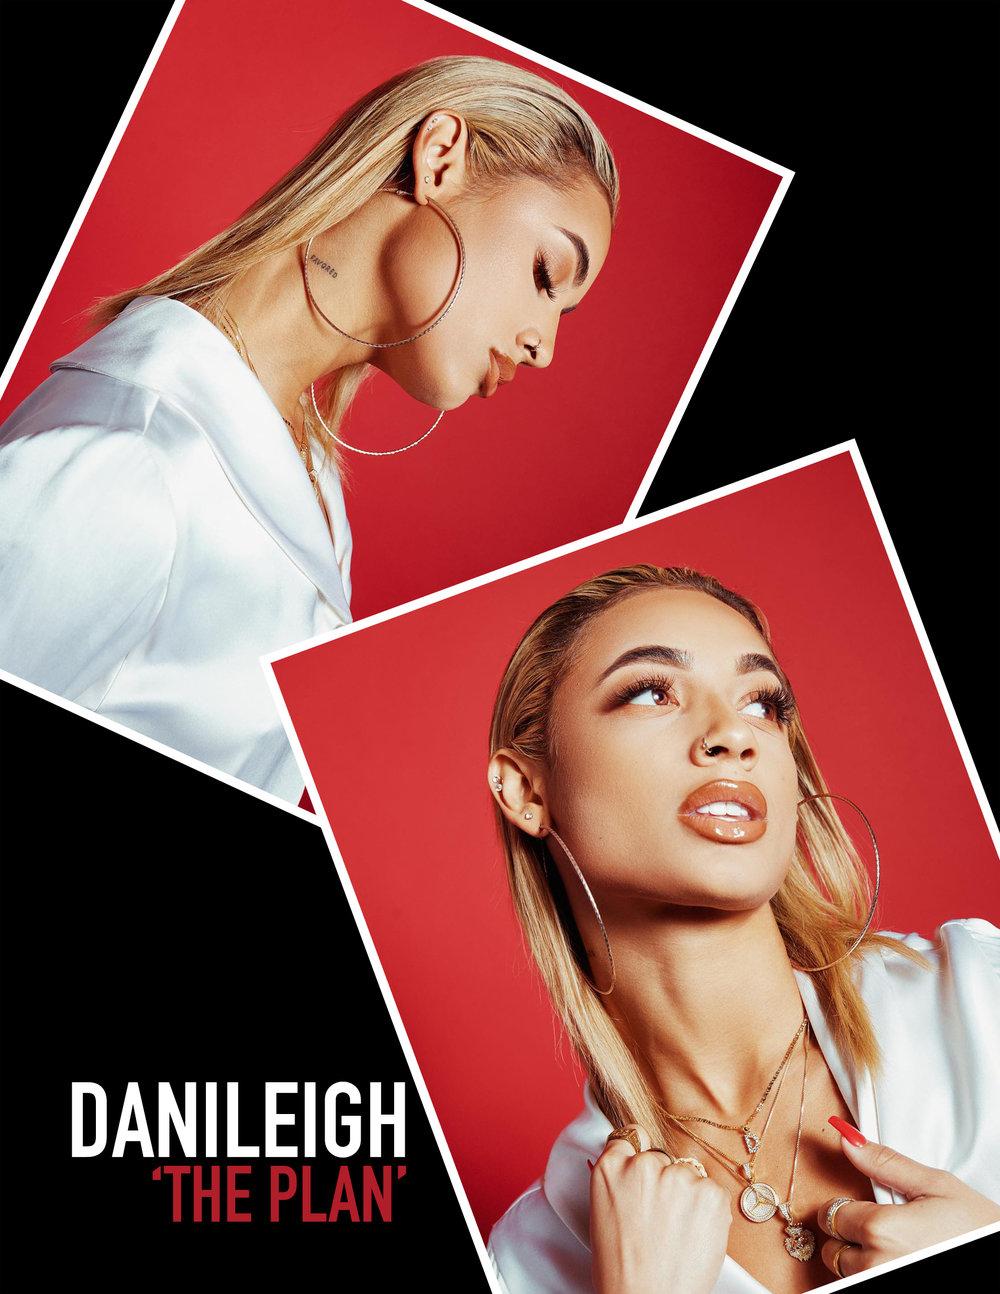 RockLan One Magazine - DaniLeigh